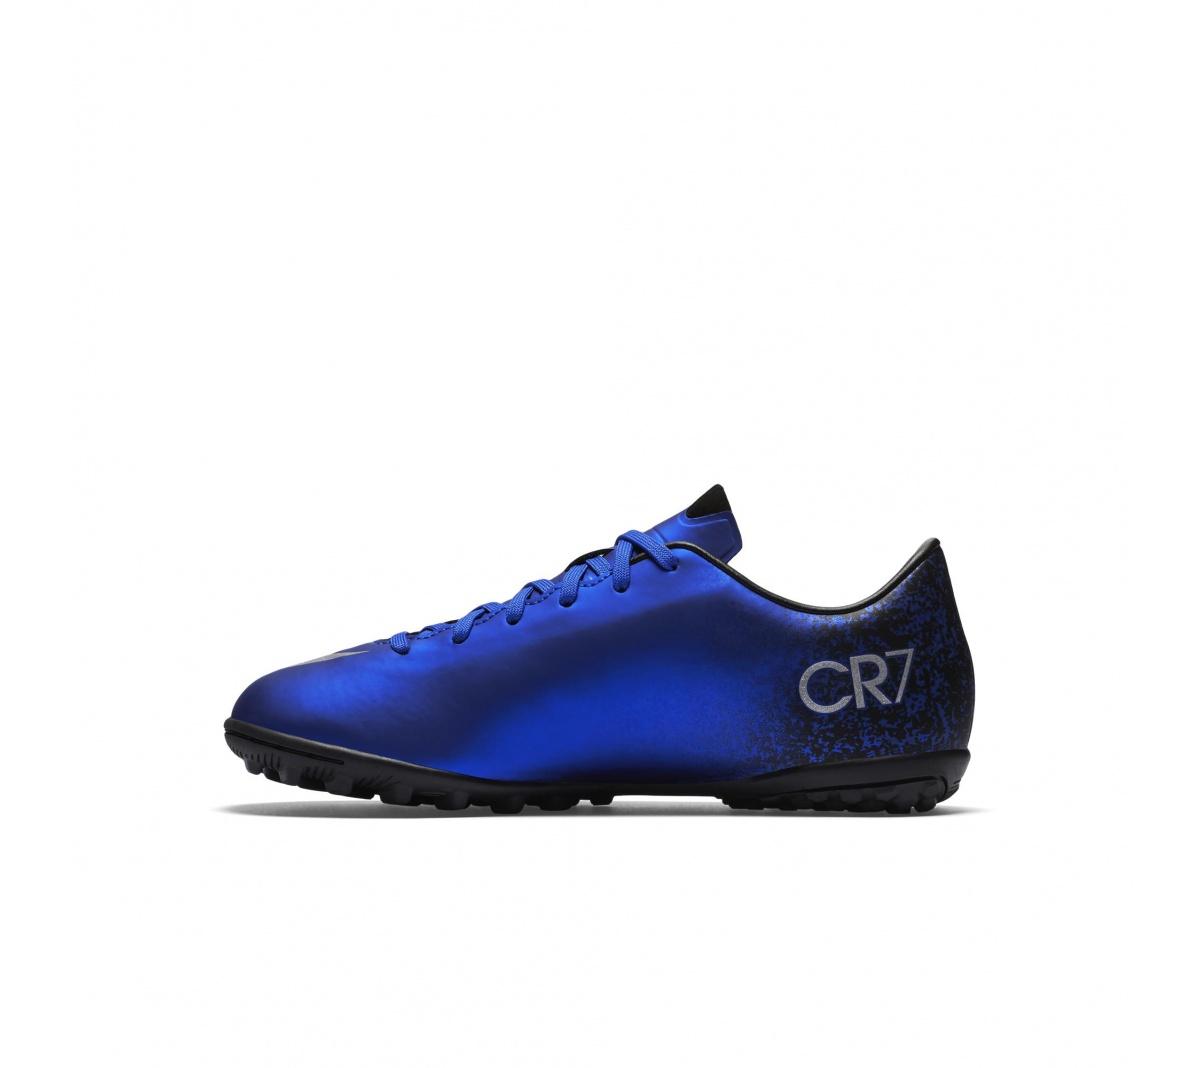 6f7f686fd6 Chuteira Nike Mercurial Victory V CR Society Inf. - Mundo do Futebol